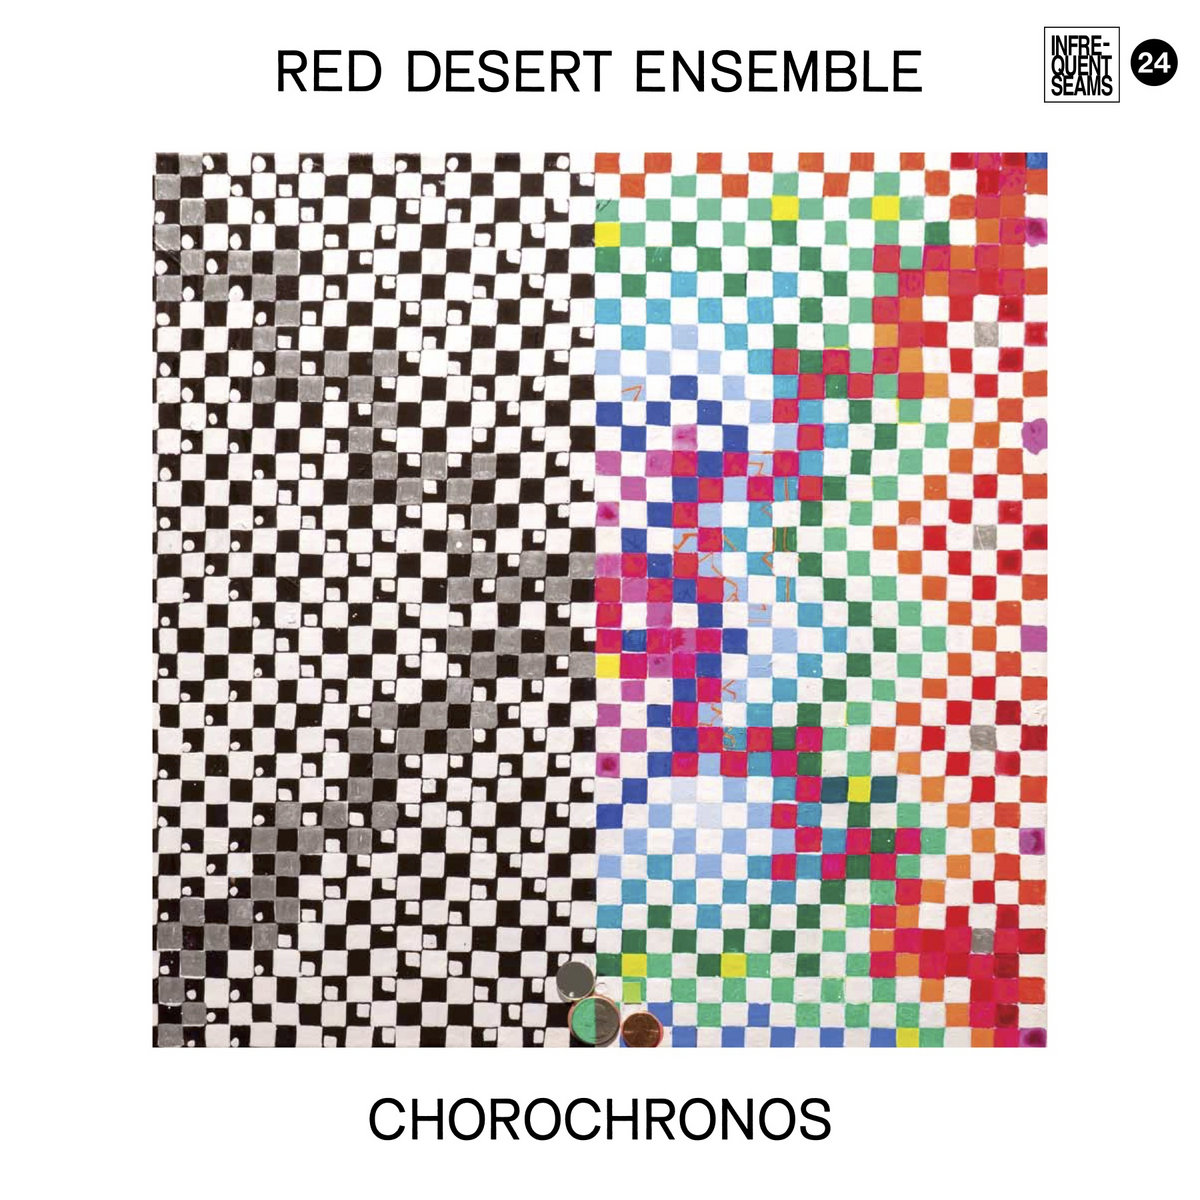 Red Desert Ensemble | CHOROCHRONOS | Infrequent Seams